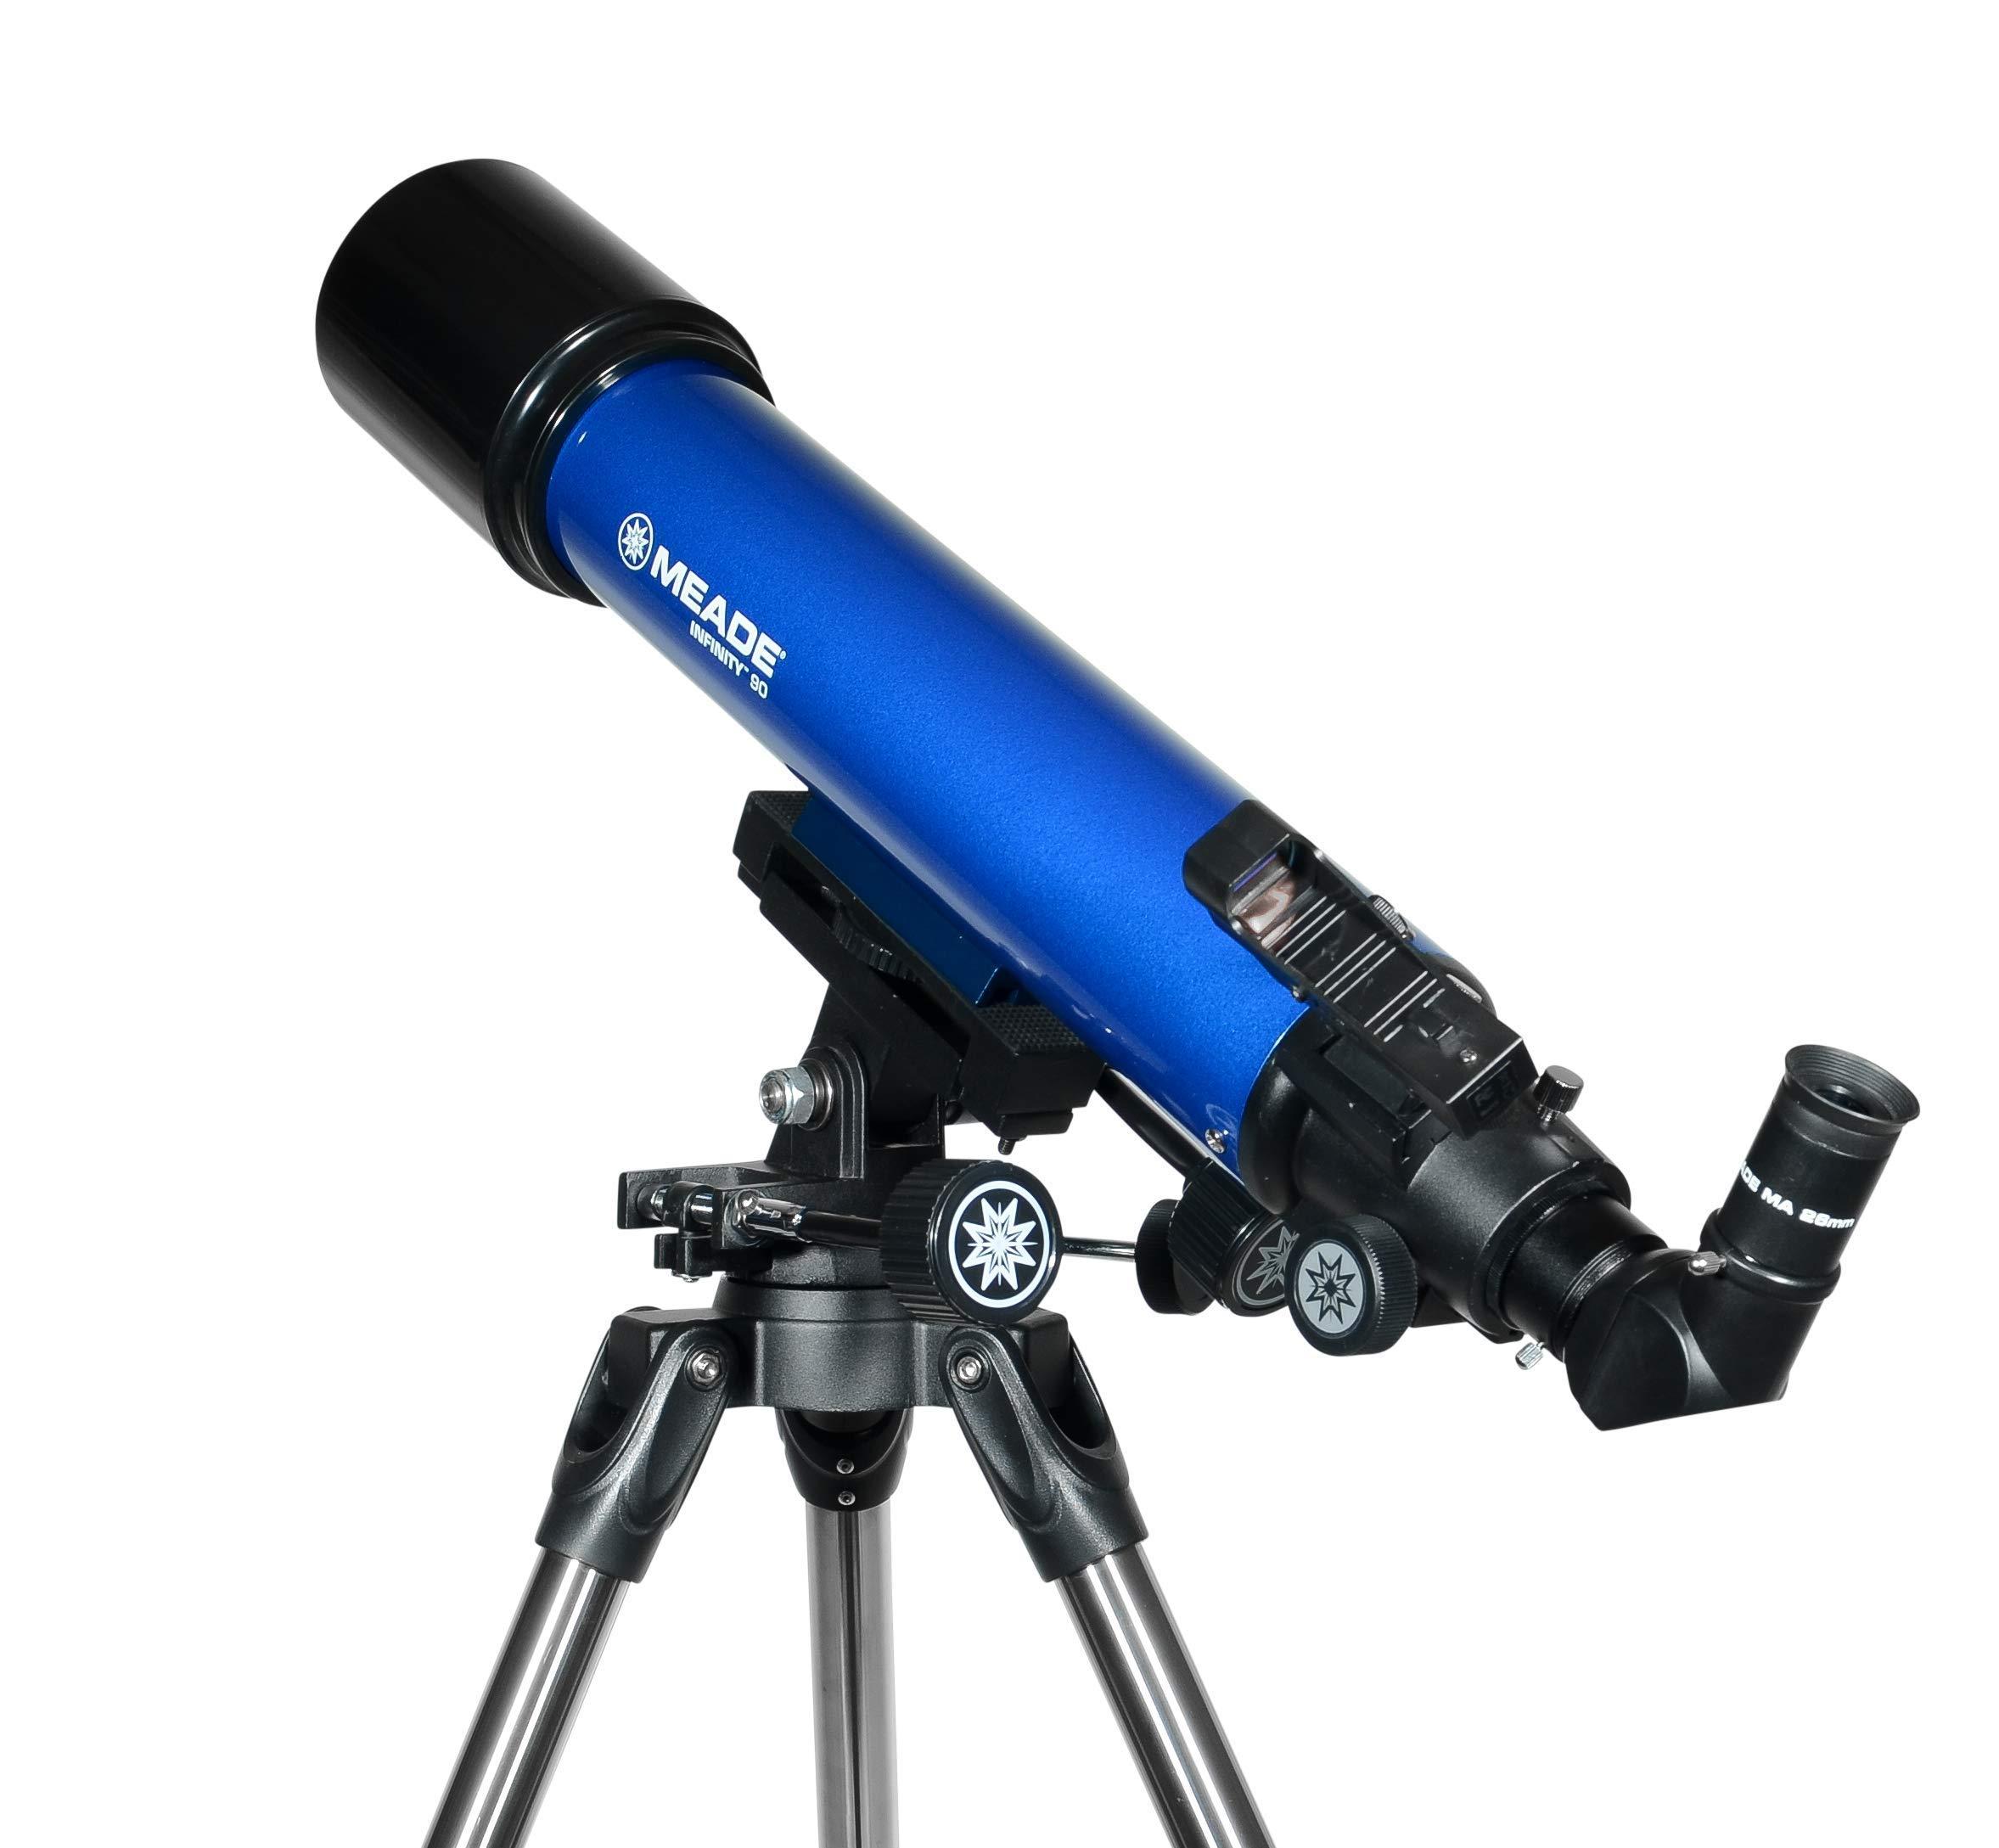 Meade Instruments 209005 Infinity 90mm AZ Refractor Telescope (Renewed) by Meade Instruments